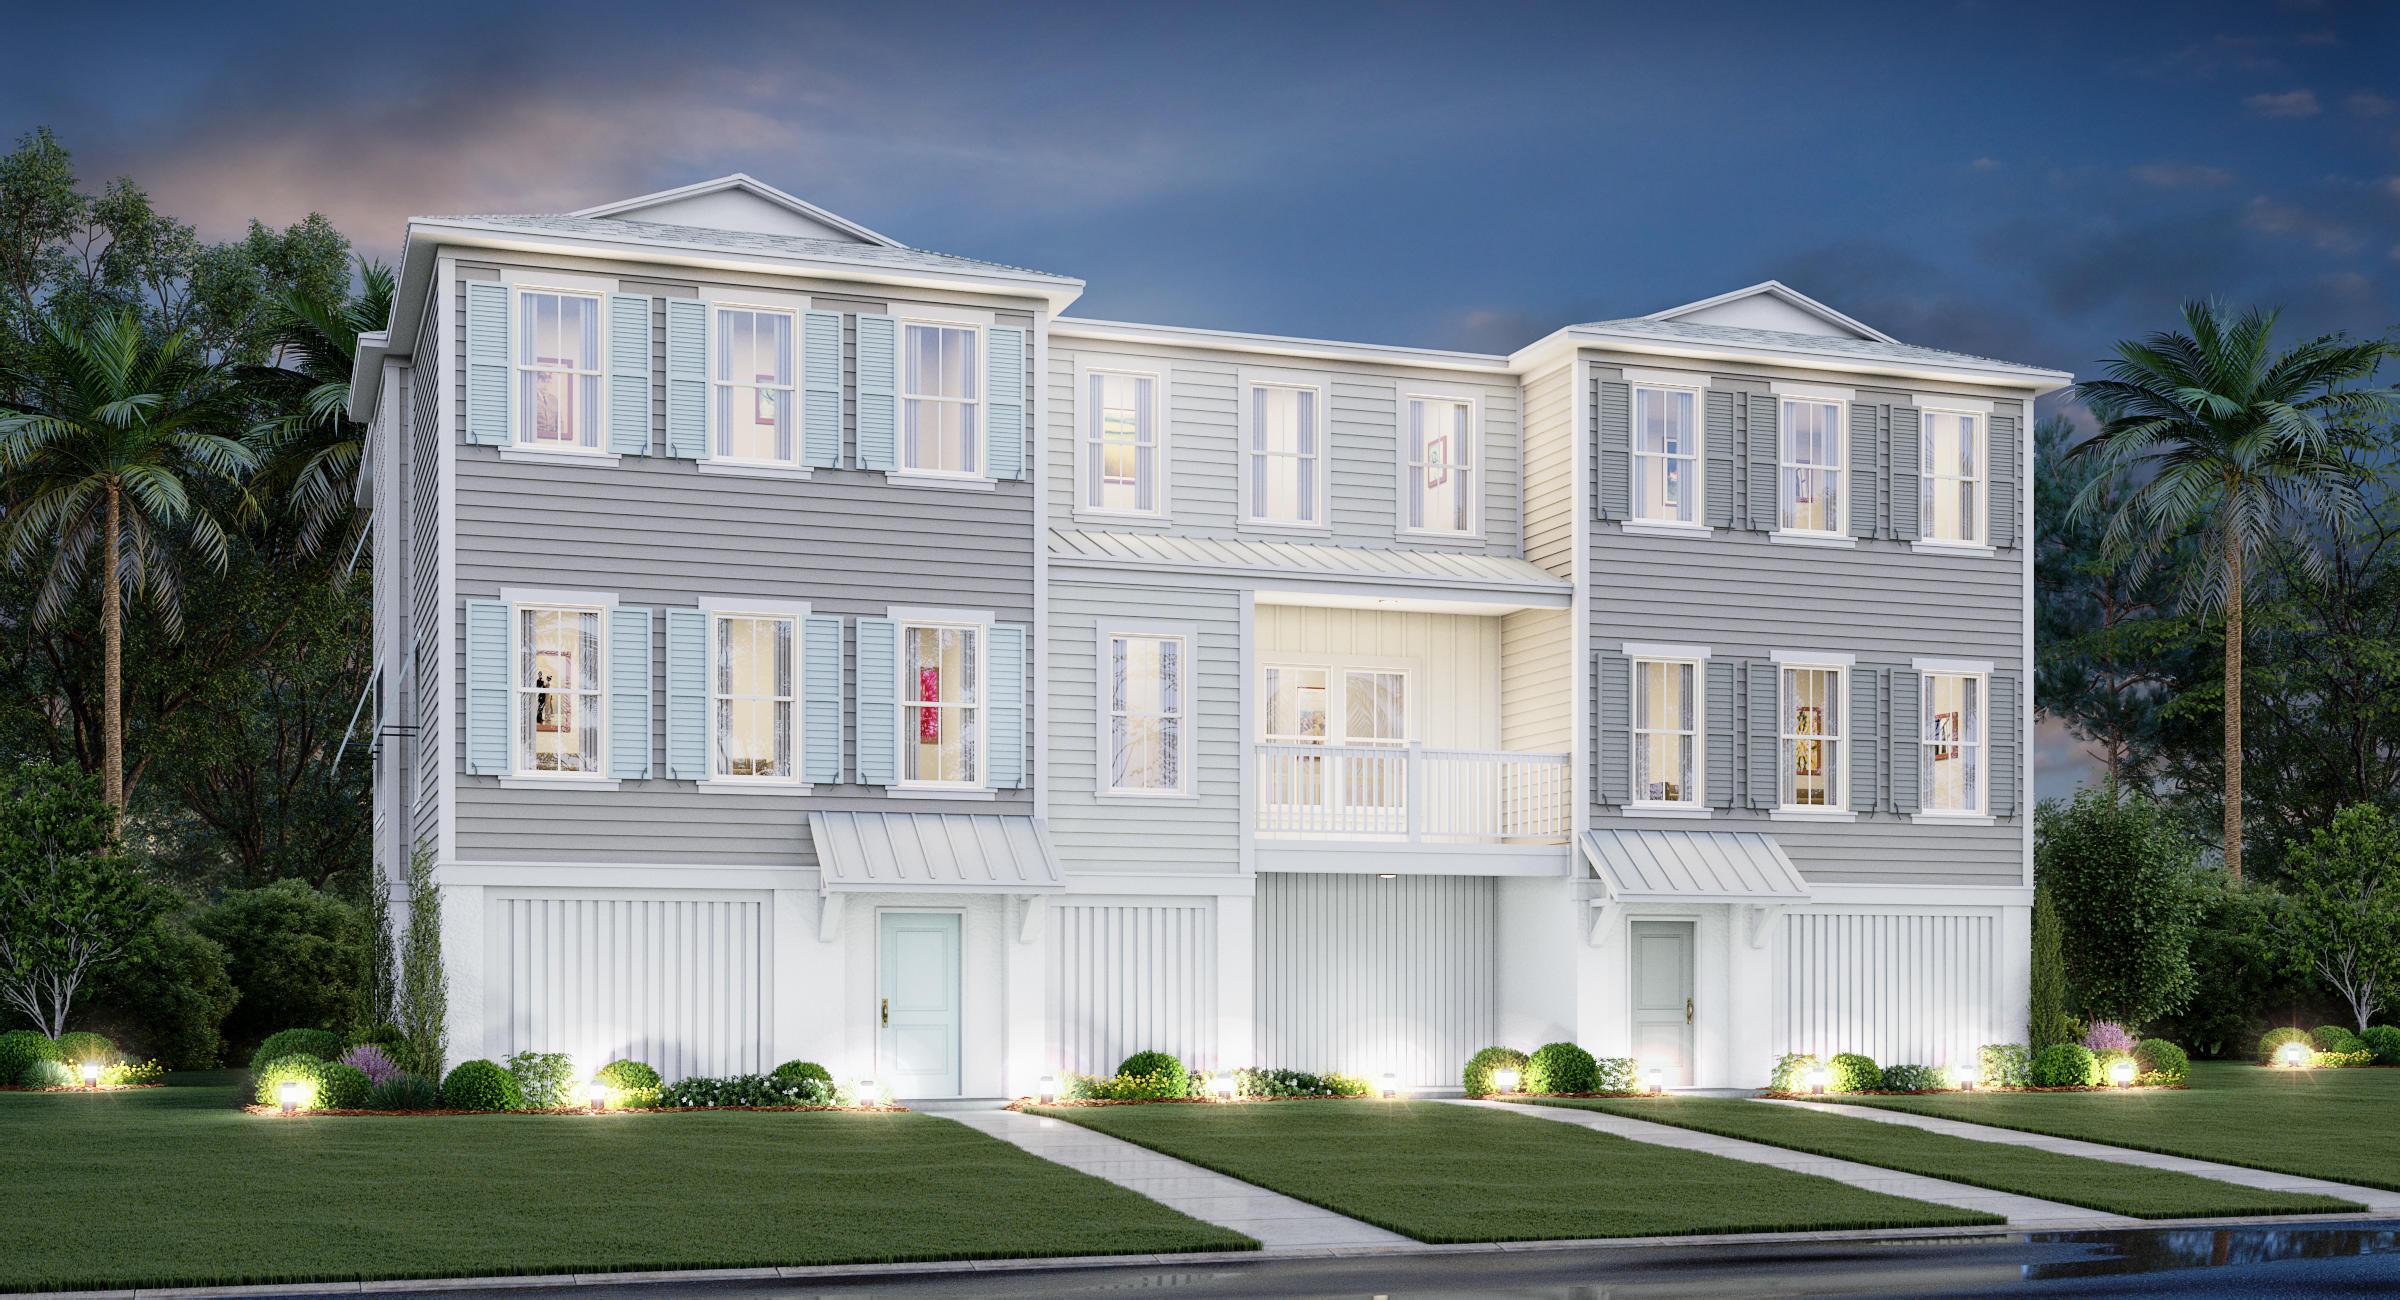 Kings Flats Homes For Sale - 105 Crozet, Charleston, SC - 8